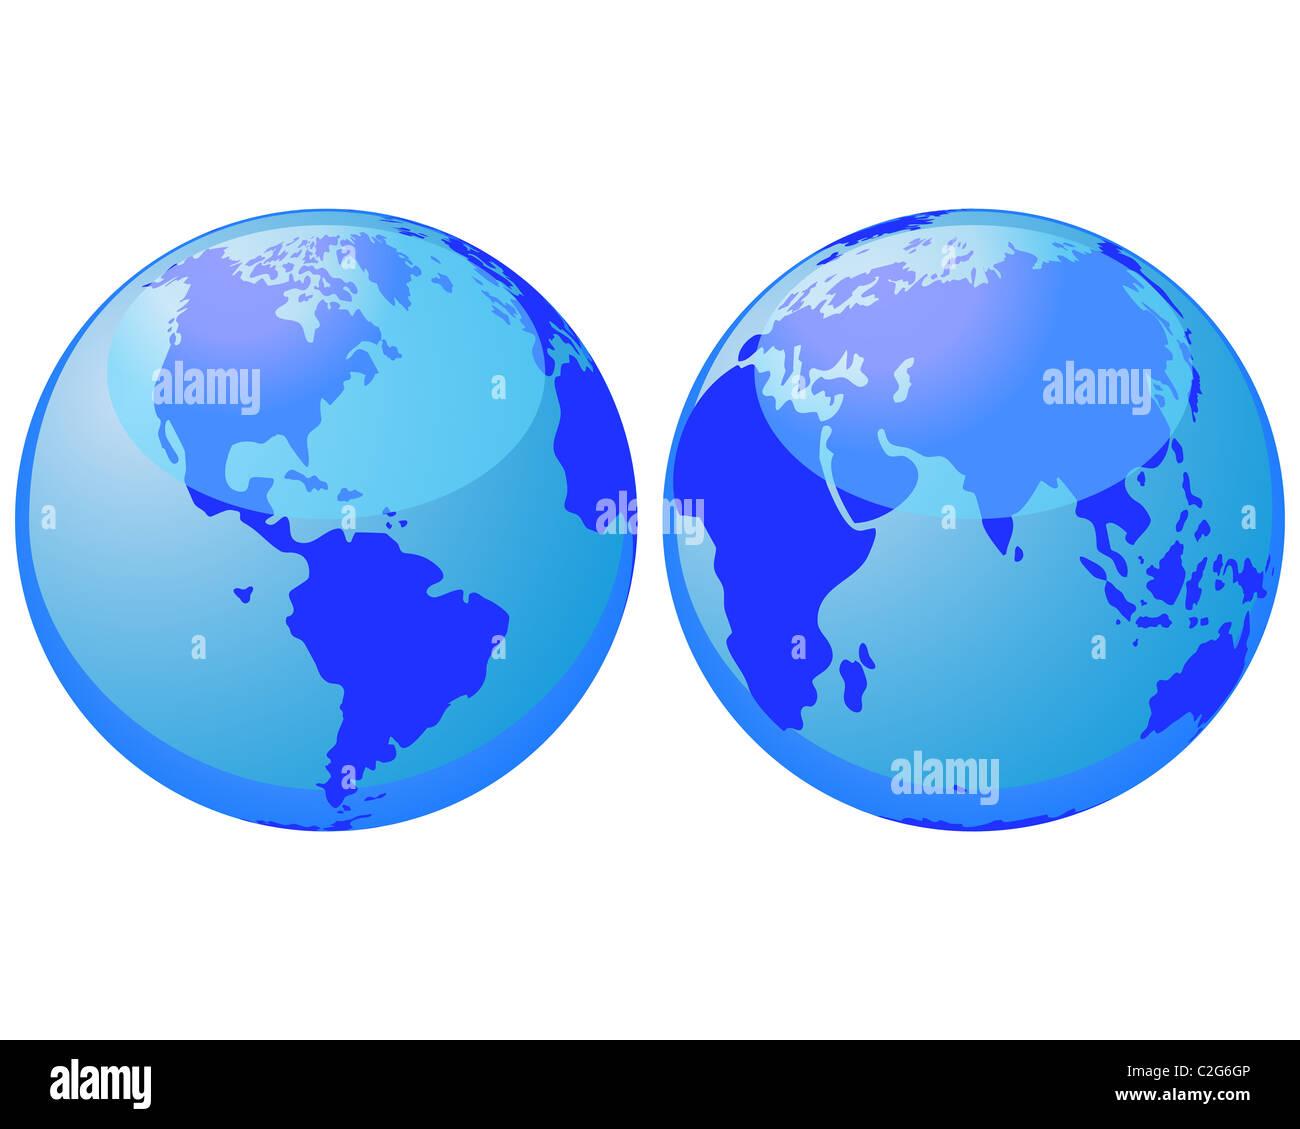 business background - Stock Image